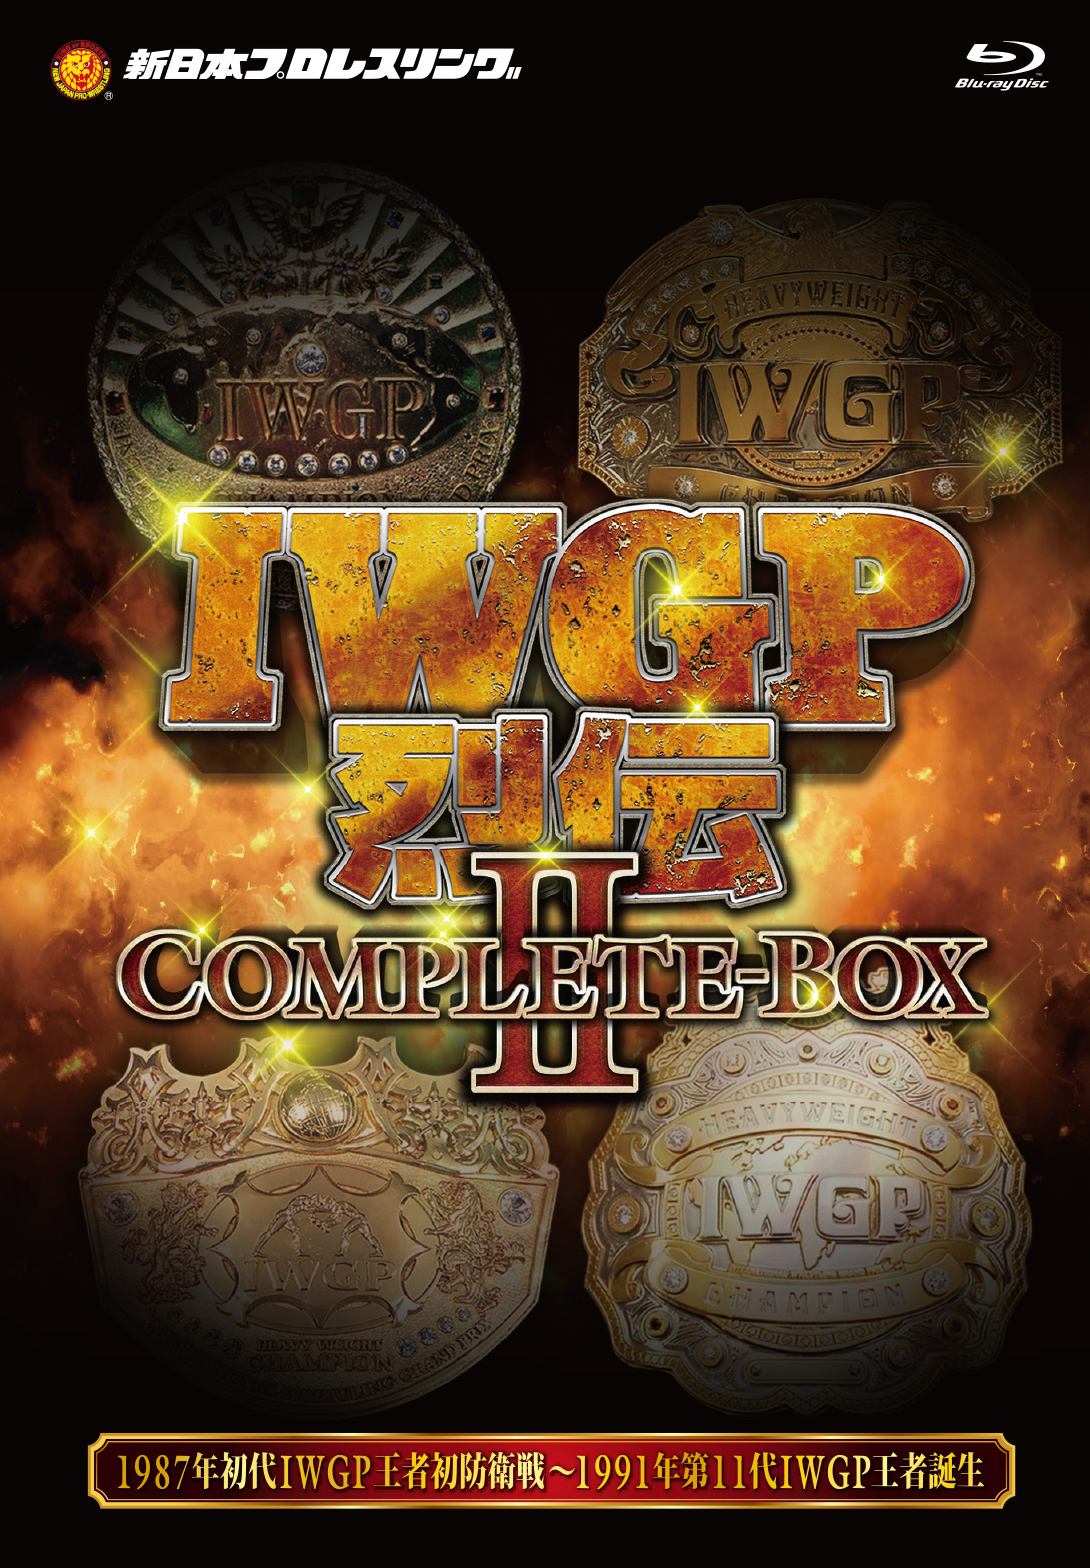 IWGP烈伝COMPLETE-BOX 2  1987年初代IWGPヘビー級王者アントニオ猪木初防衛戦~1991年第11代IWGPヘビー級王者藤波辰爾誕生【Blu-ray-BOX】